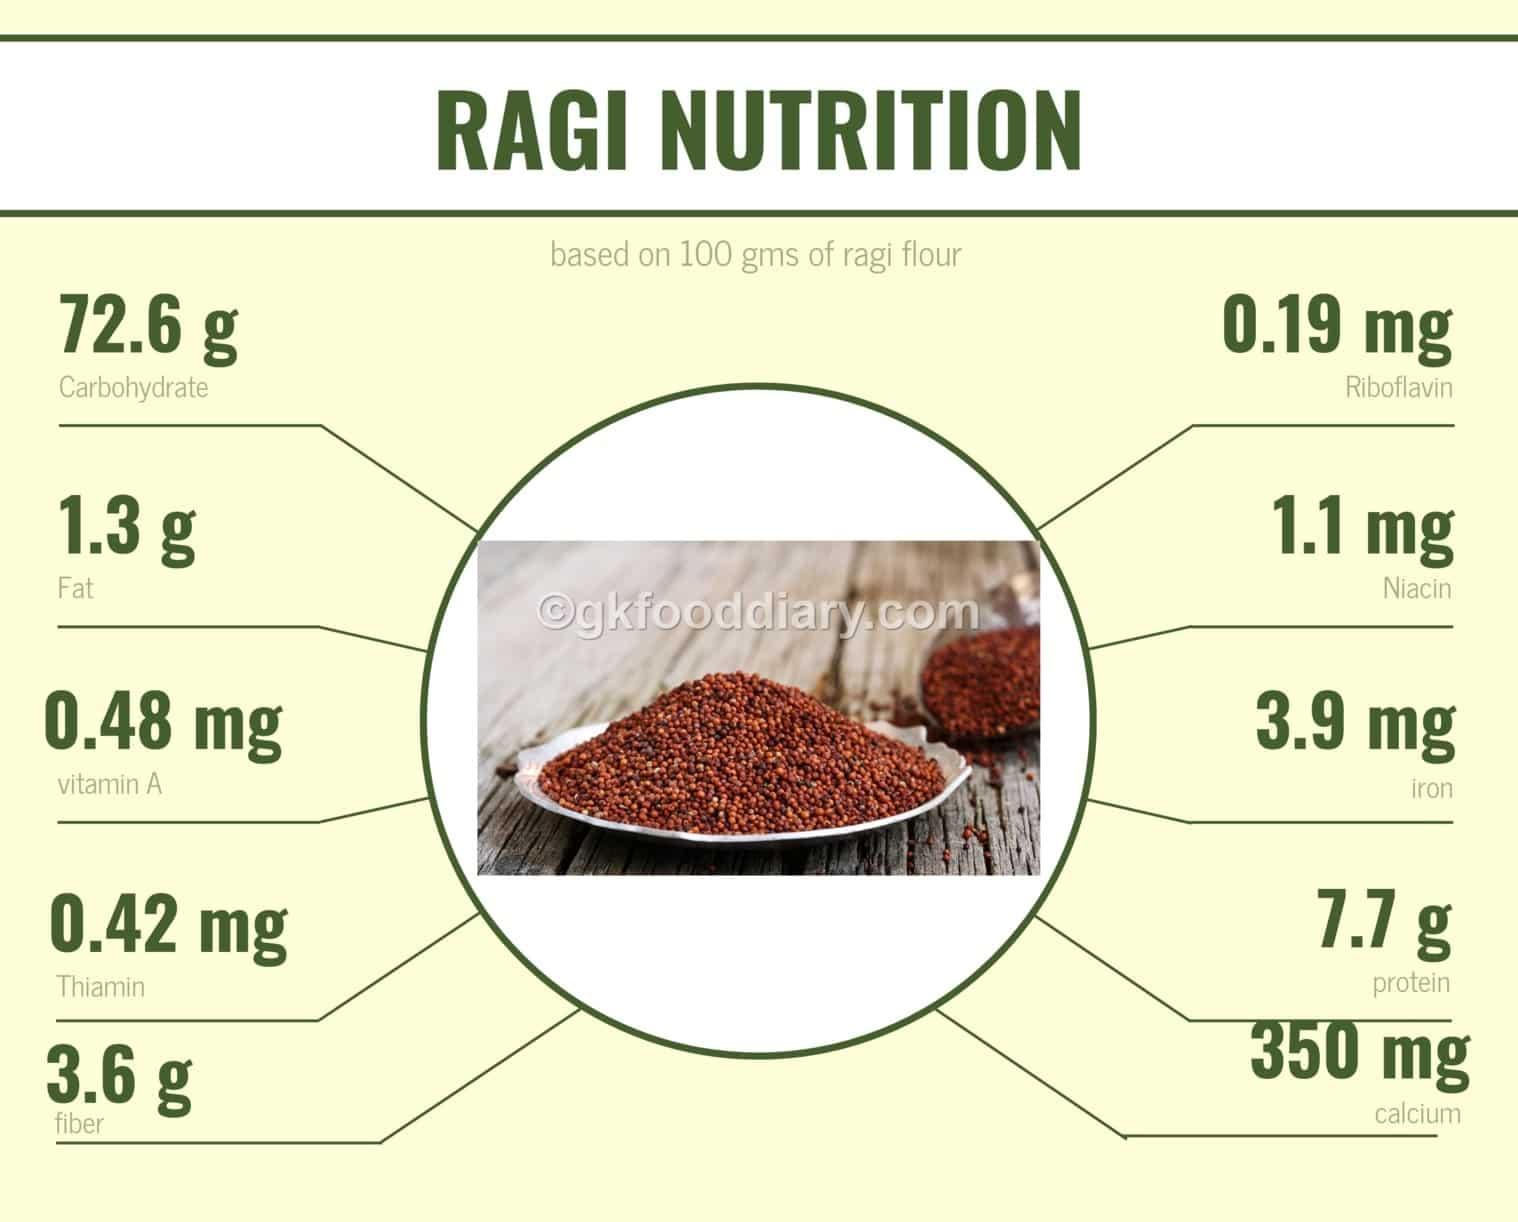 Ragi Finger Millet Nutrition